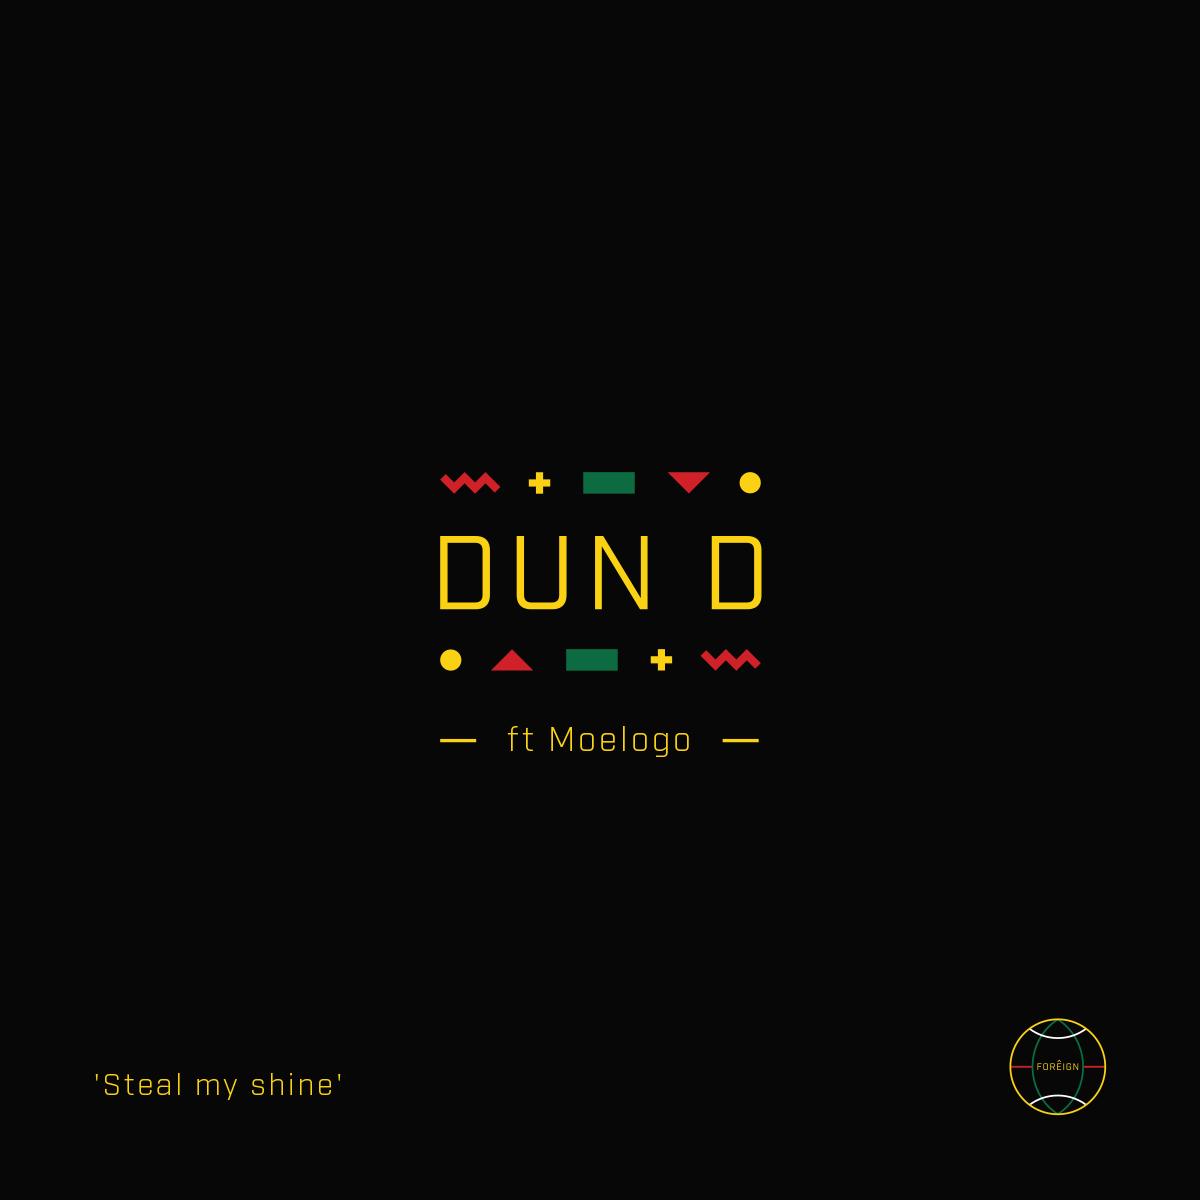 dun-d-moelogo-steal-my-shine-artwork